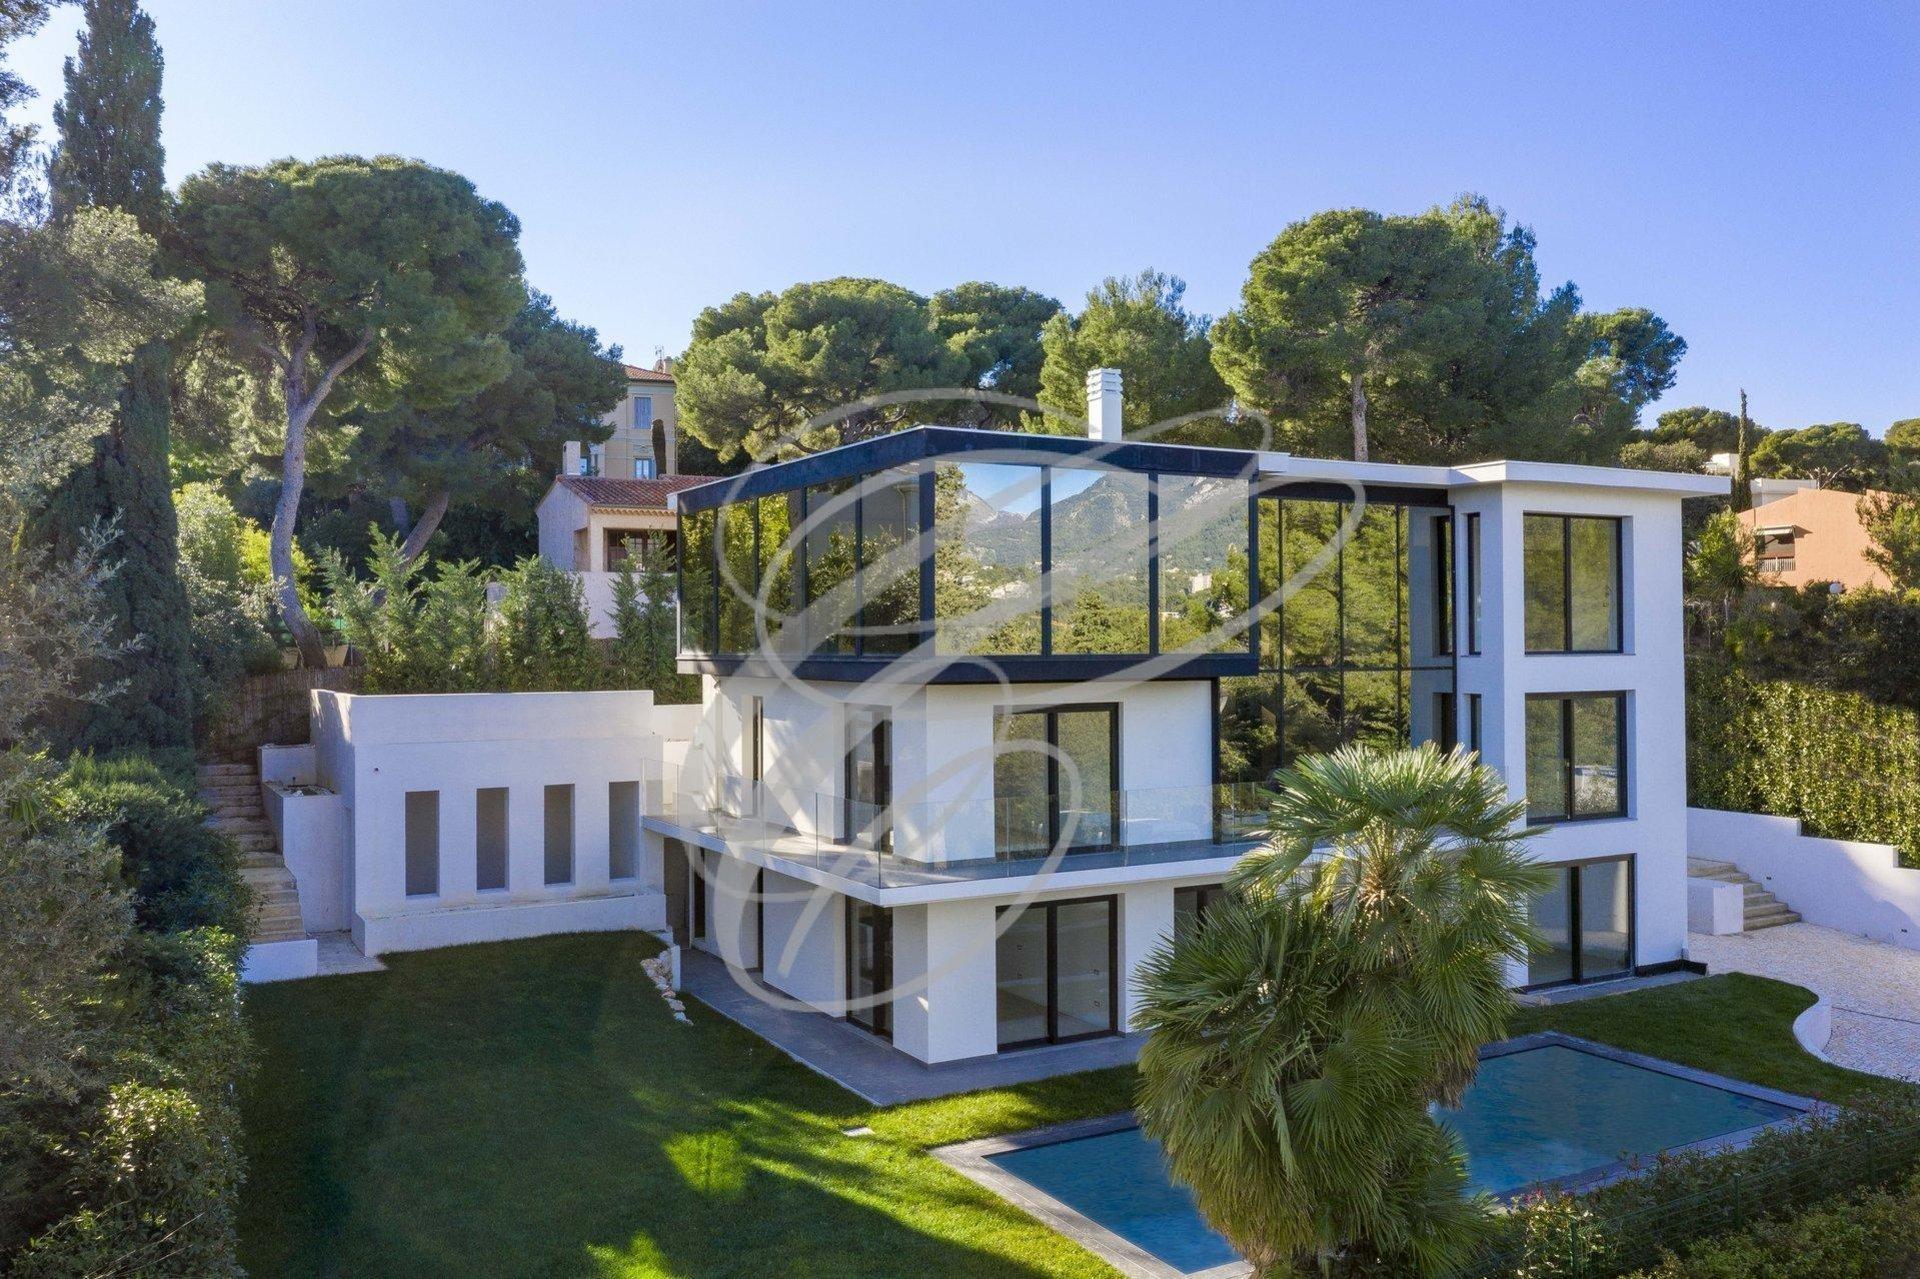 Villa in Roquebrune-Cap-Martin, Provence-Alpes-Côte d'Azur, France 1 - 10966441